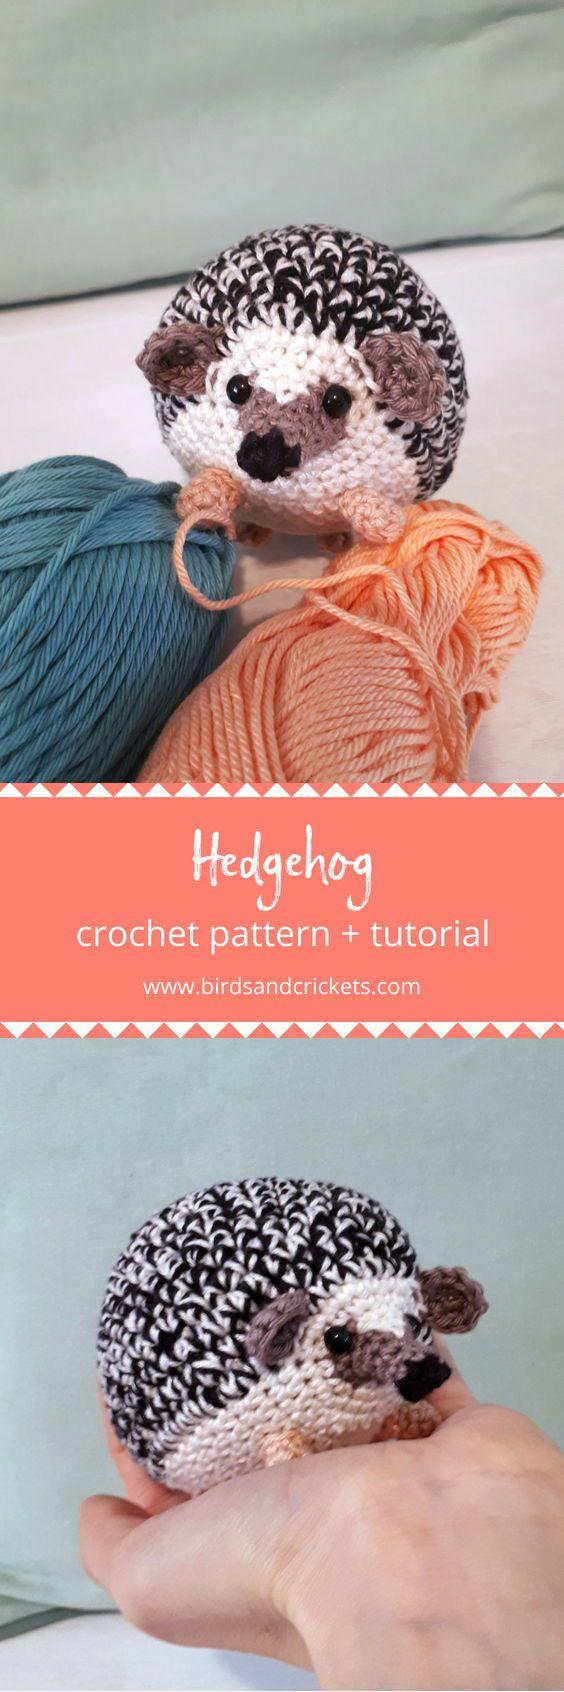 Hedgehog crochet pattern | Pinterest | Häckeln, Häkeln und Häkeltiere